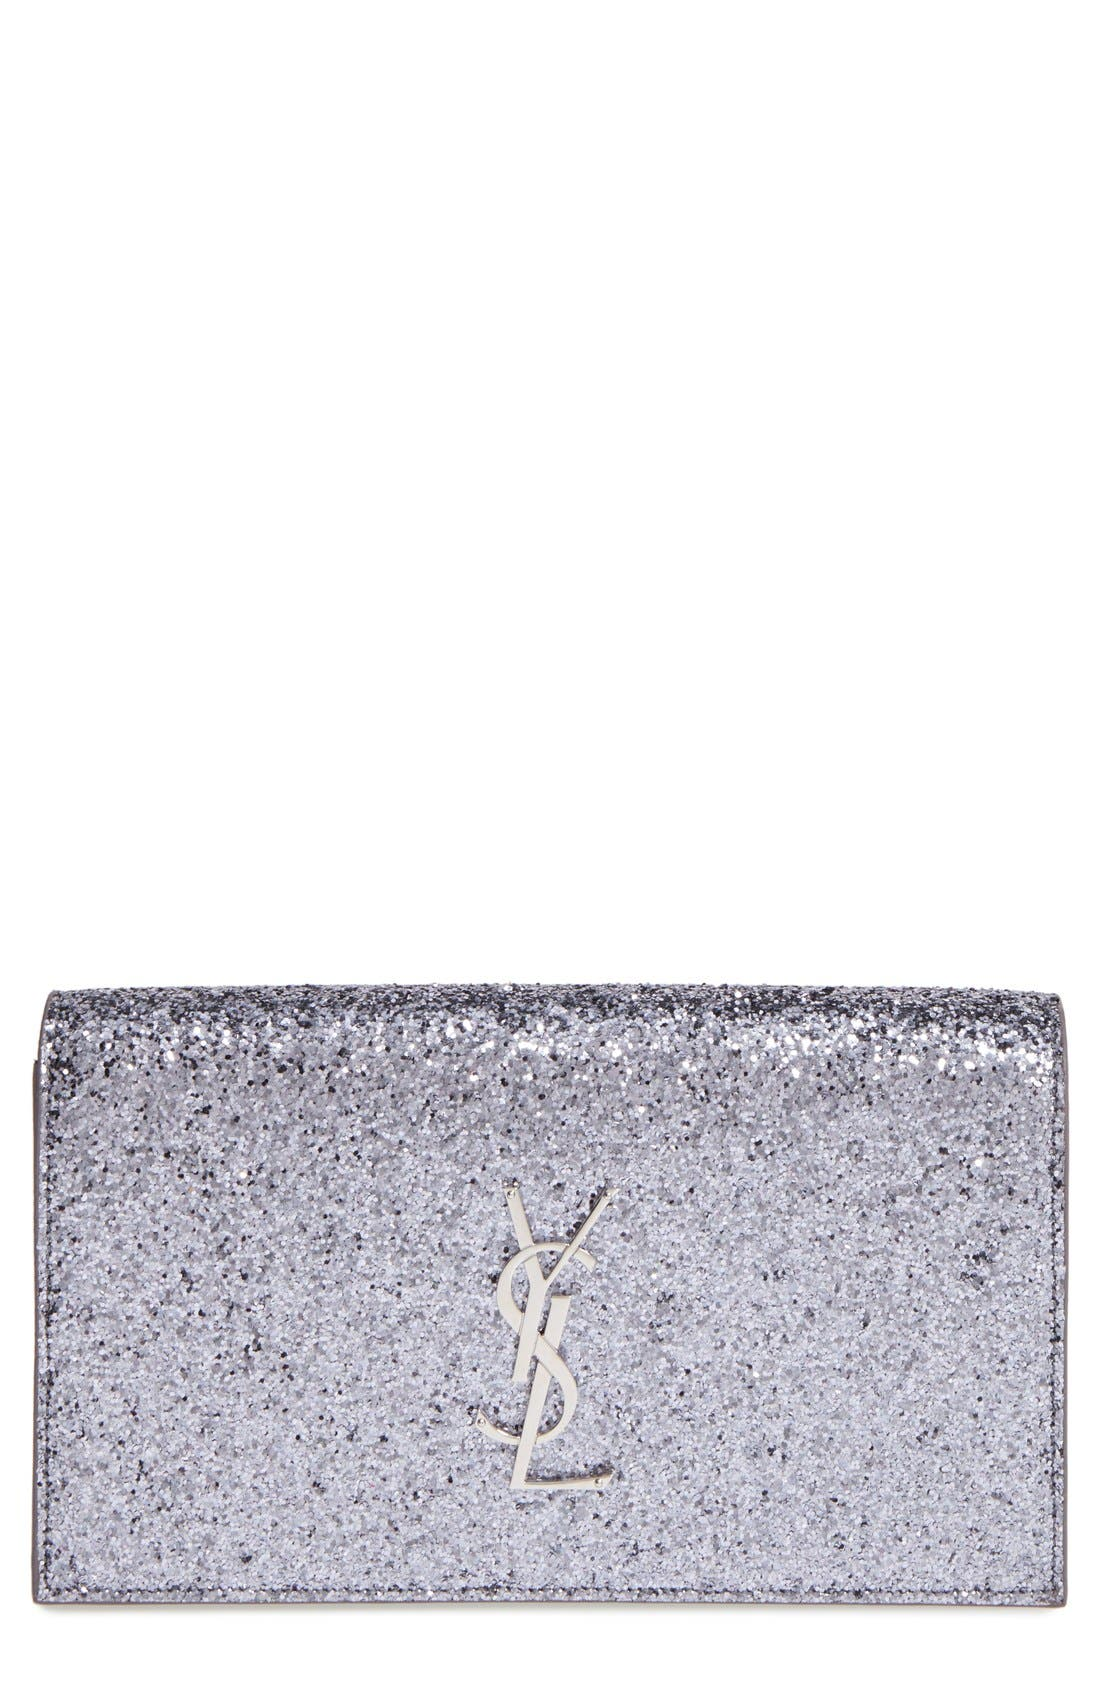 Alternate Image 1 Selected - Saint Laurent 'Monogram Kate' Glitter Clutch